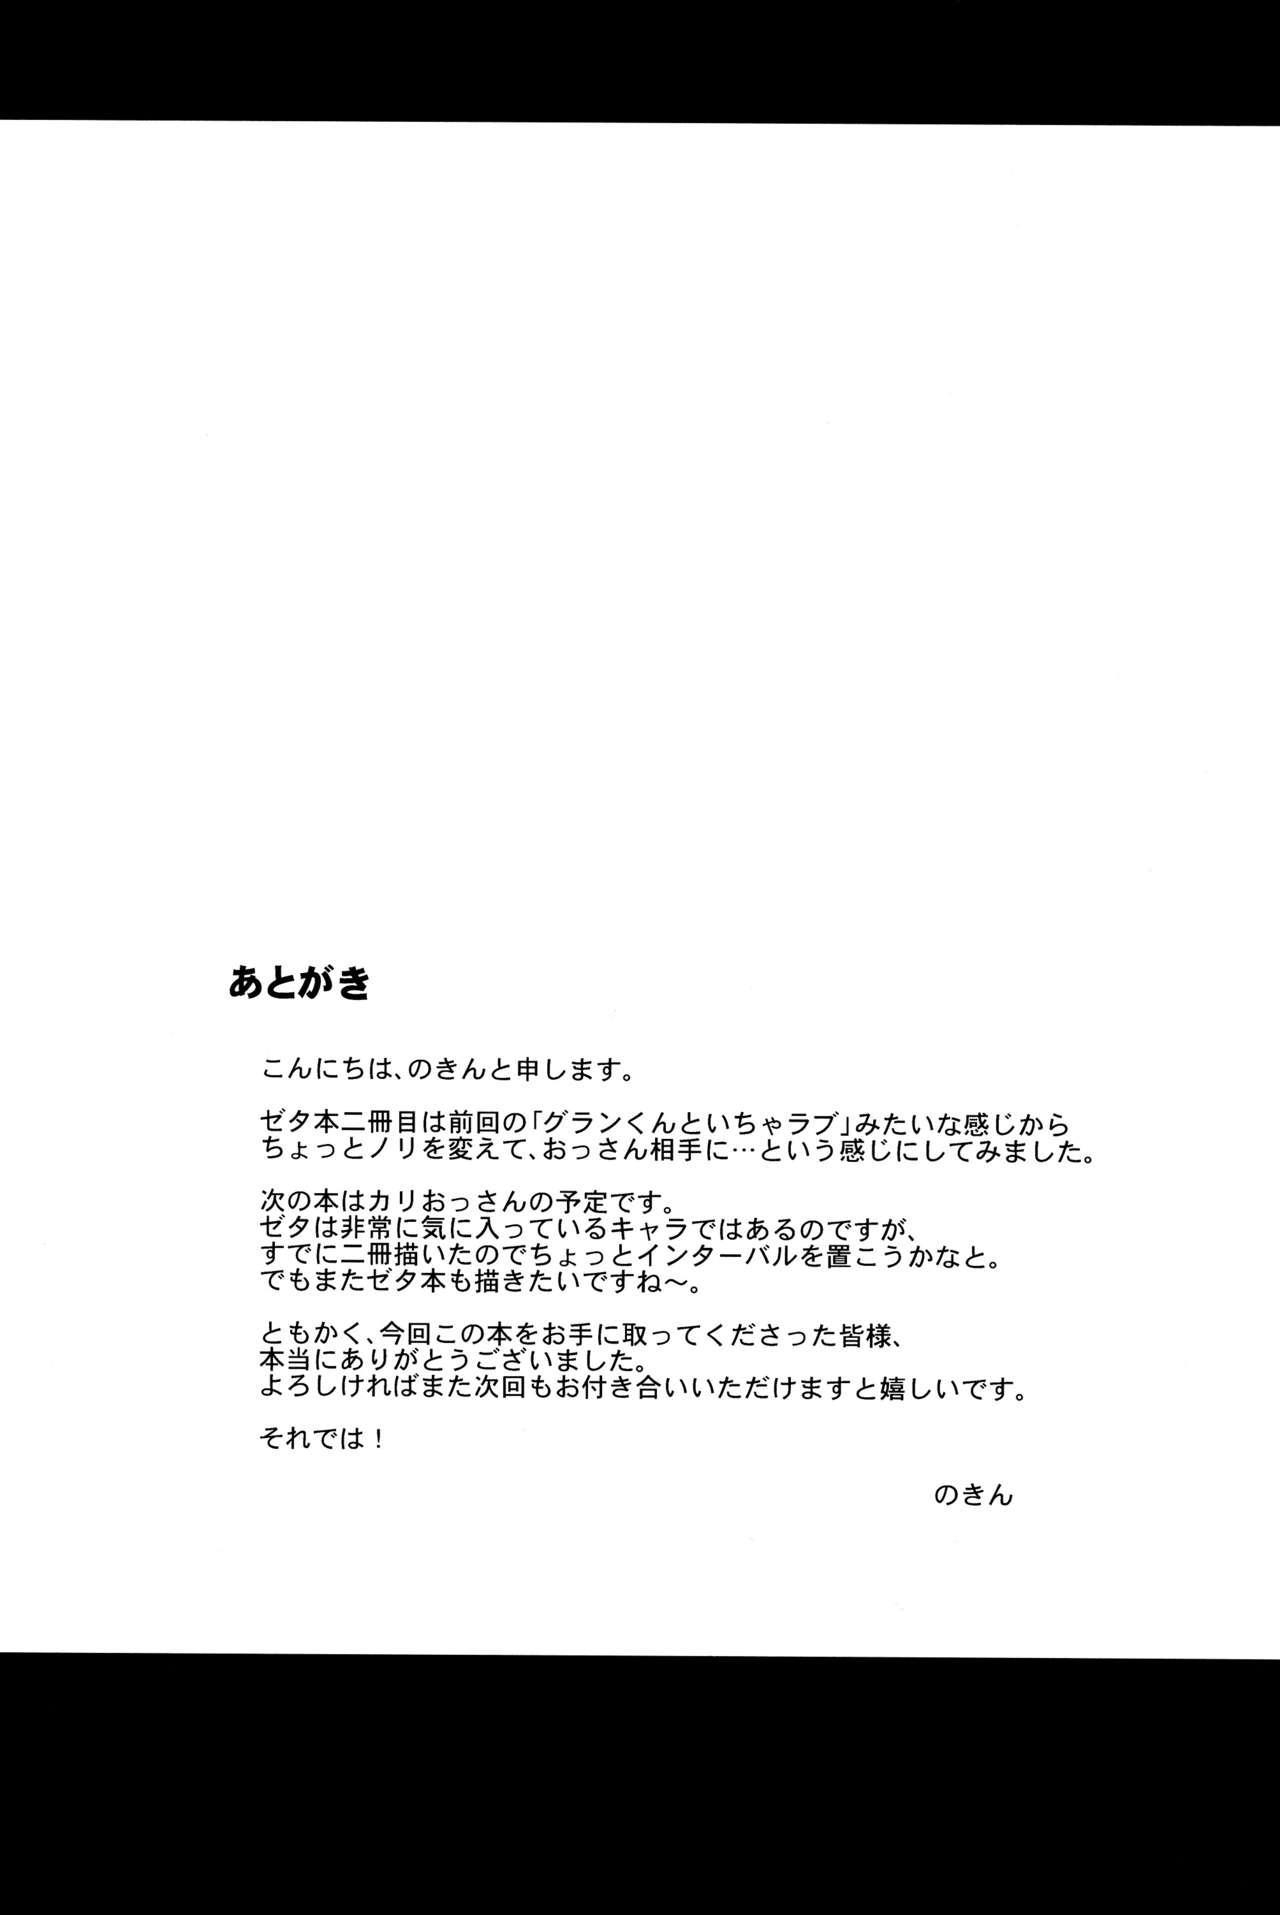 Zeta-hime, Kanraku. 23